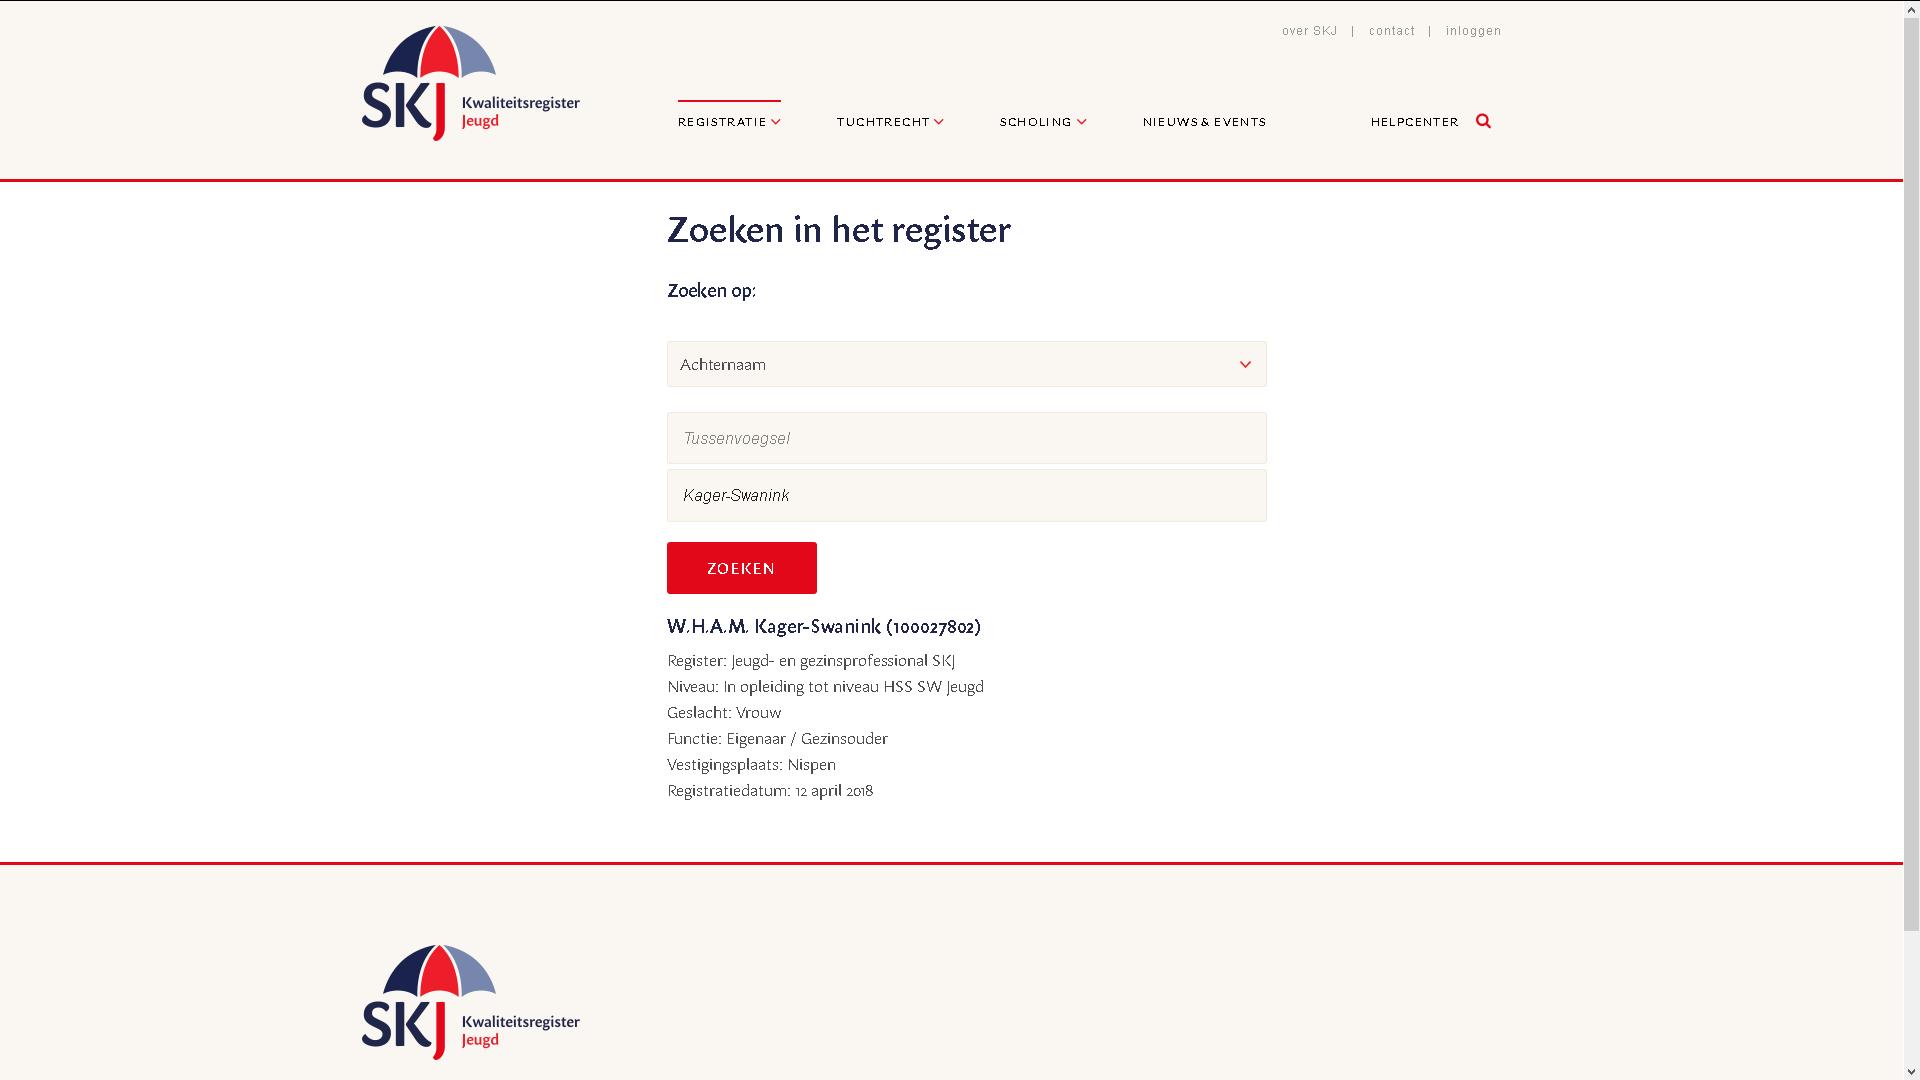 SKJ registratie kwaliteitsregister jeugd Willeanne Kager-Swanink